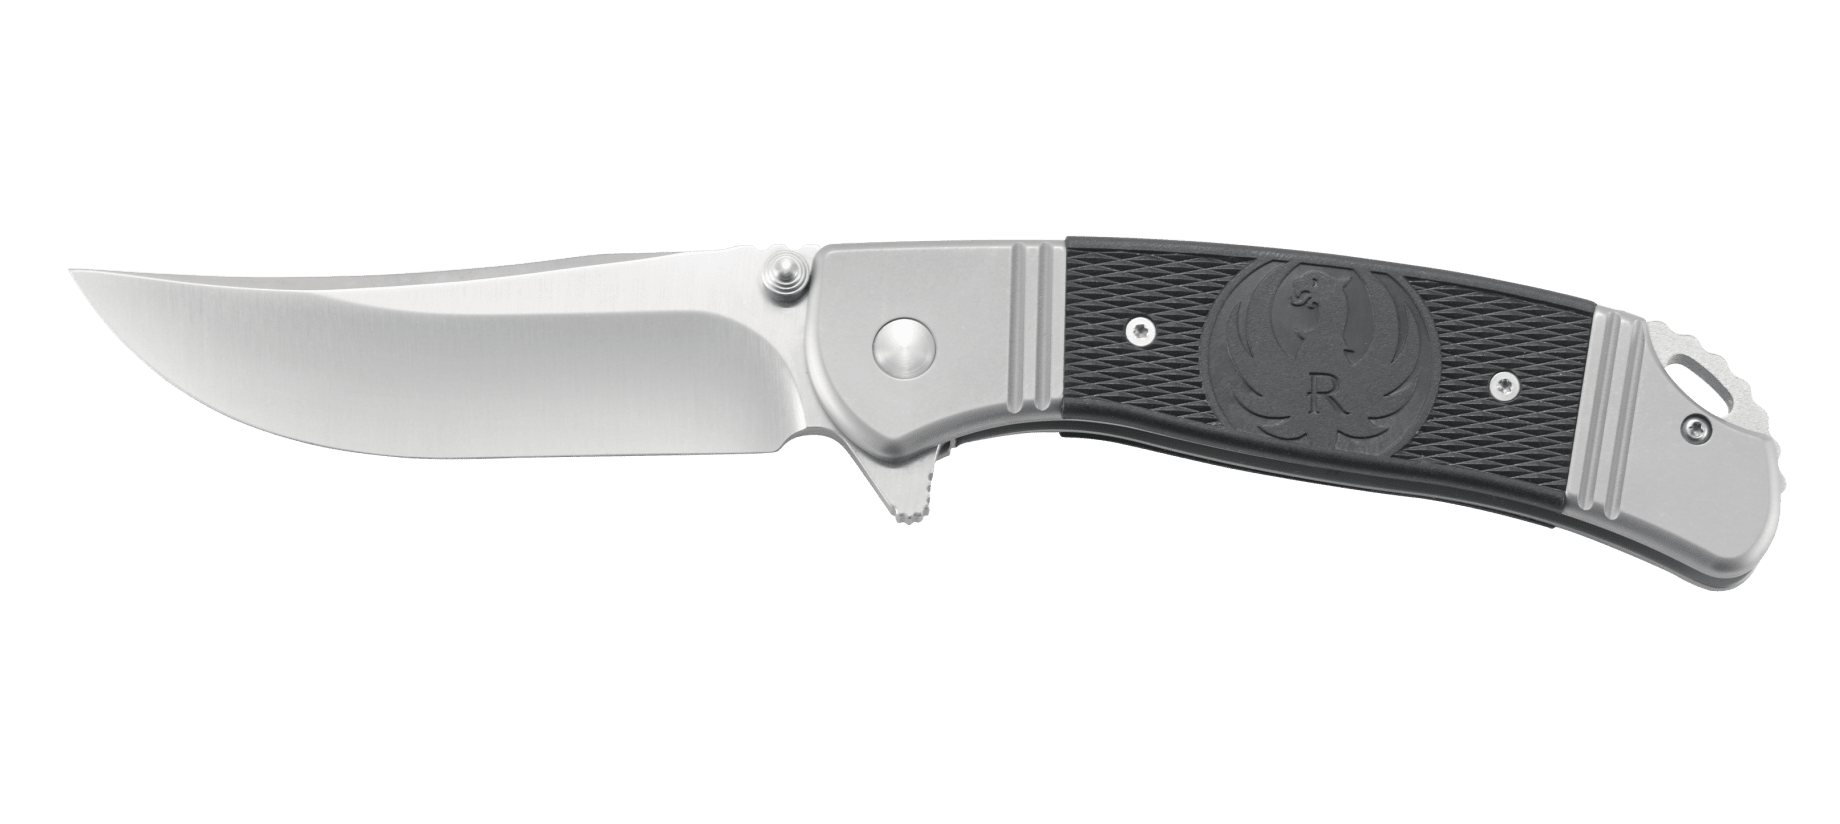 Фото 17 - Складной нож CRKT R2301 Ruger® Knives Hollow-Point™ +P, сталь 8Cr14MOV, рукоять нержавеющая сталь/термопластик